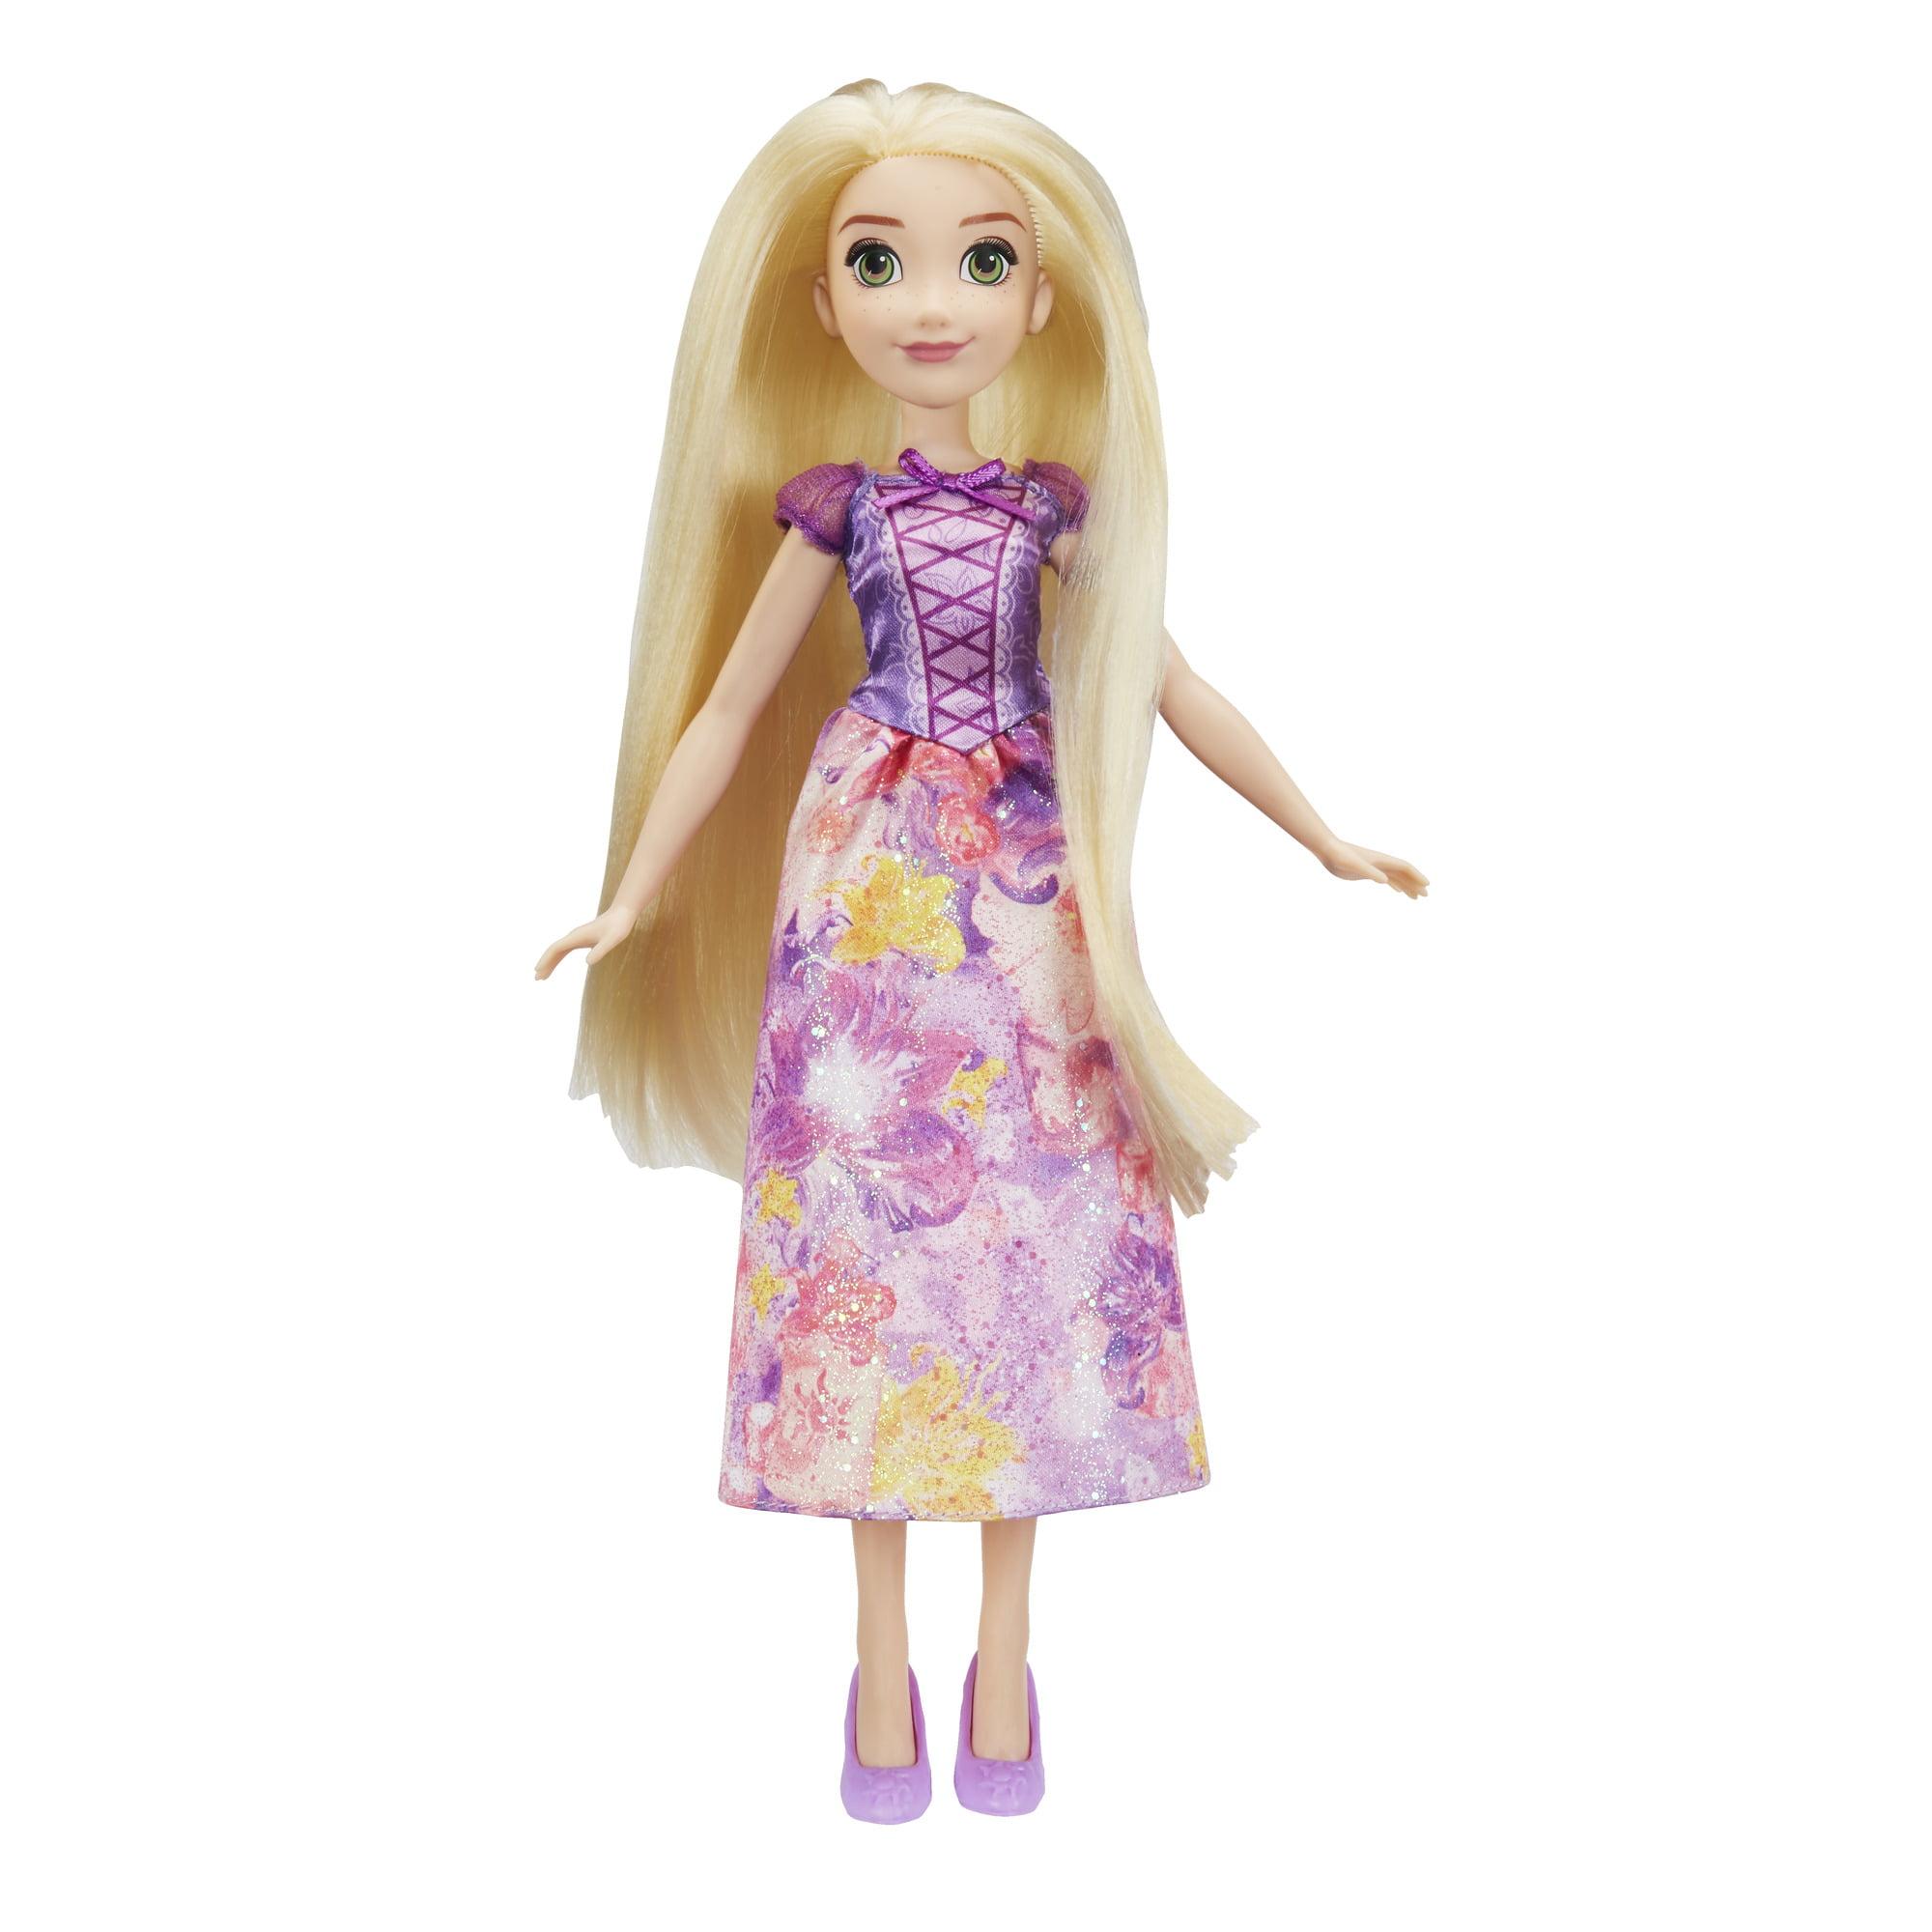 Disney Princess Royal Shimmer Rapunzel Doll by Hasbro Inc.